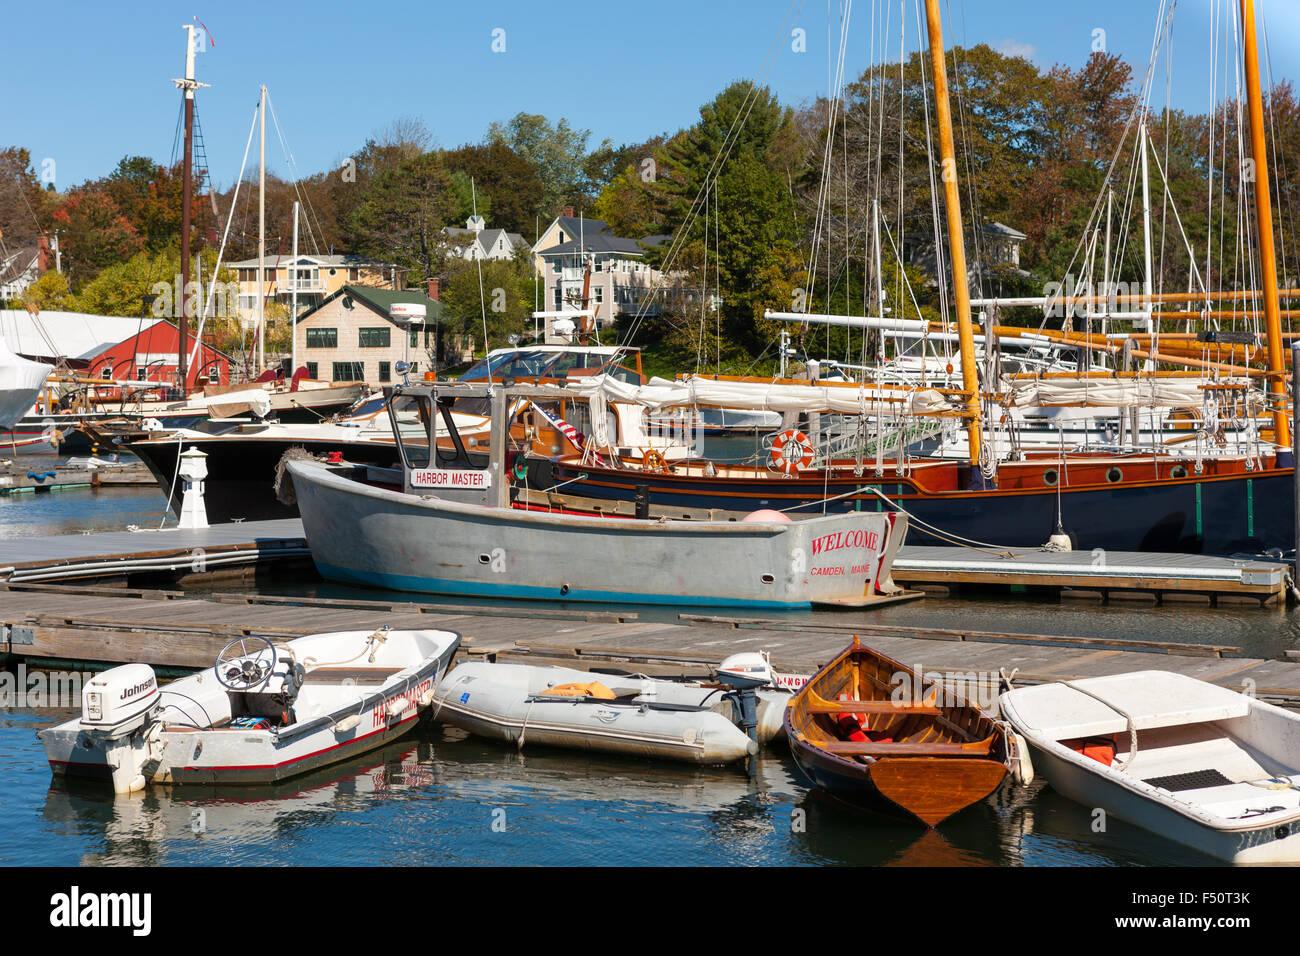 Dinghies line a dock in front of schooners and windjammers anchored in Camden harbor in Camden, Maine. - Stock Image